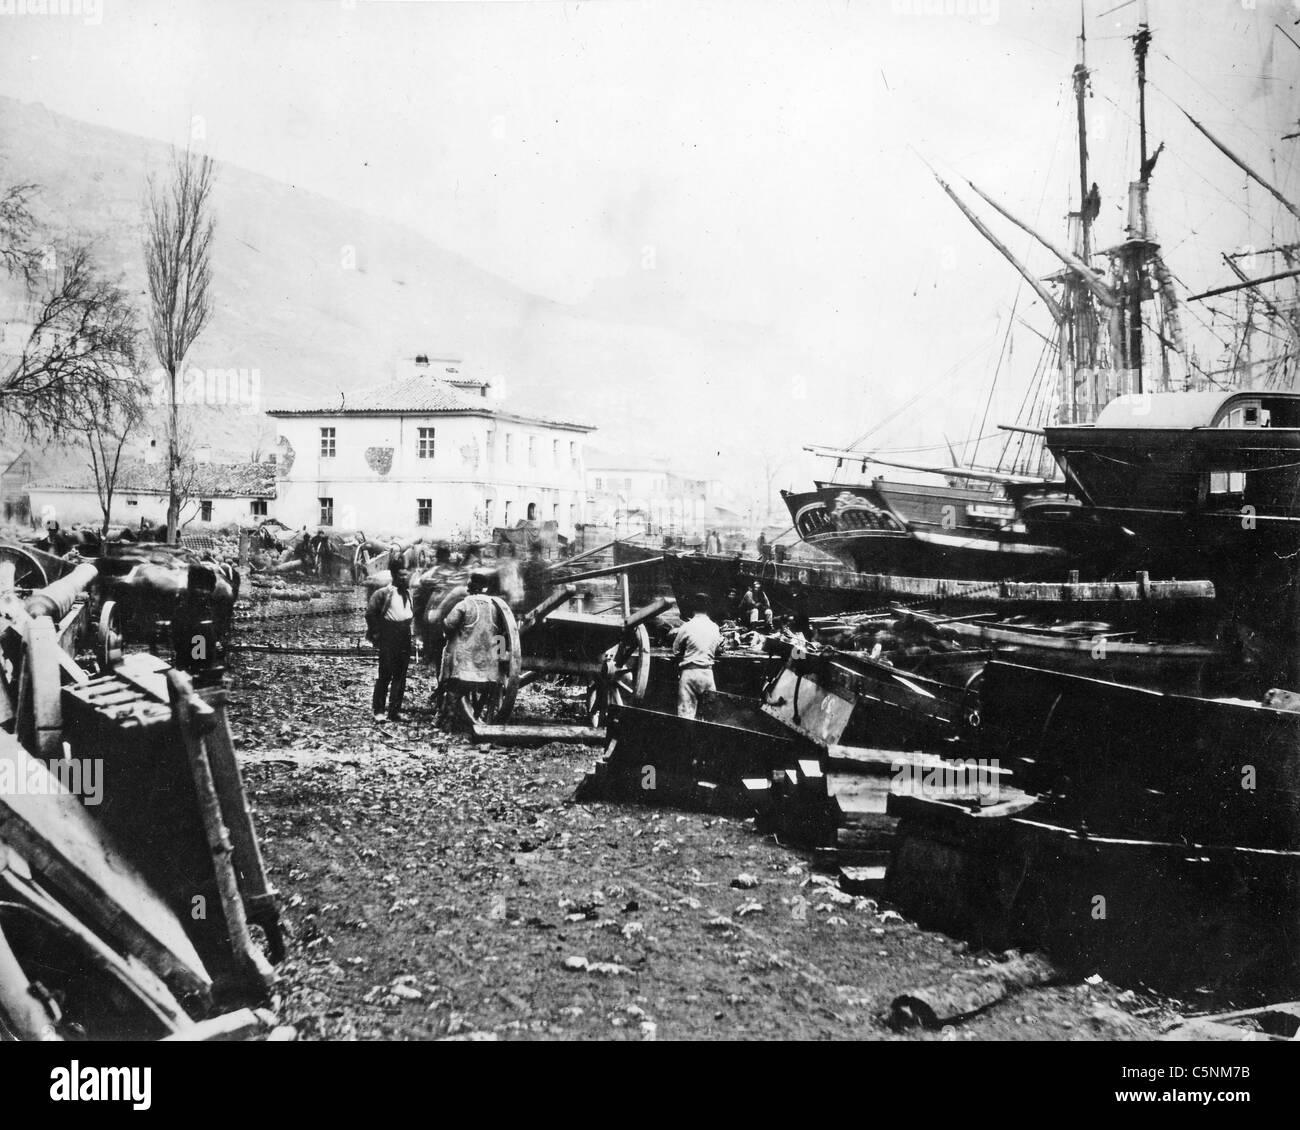 CRIMEAN WAR (1853-1856) Allies unloading supplies at Balaclava - Stock Image